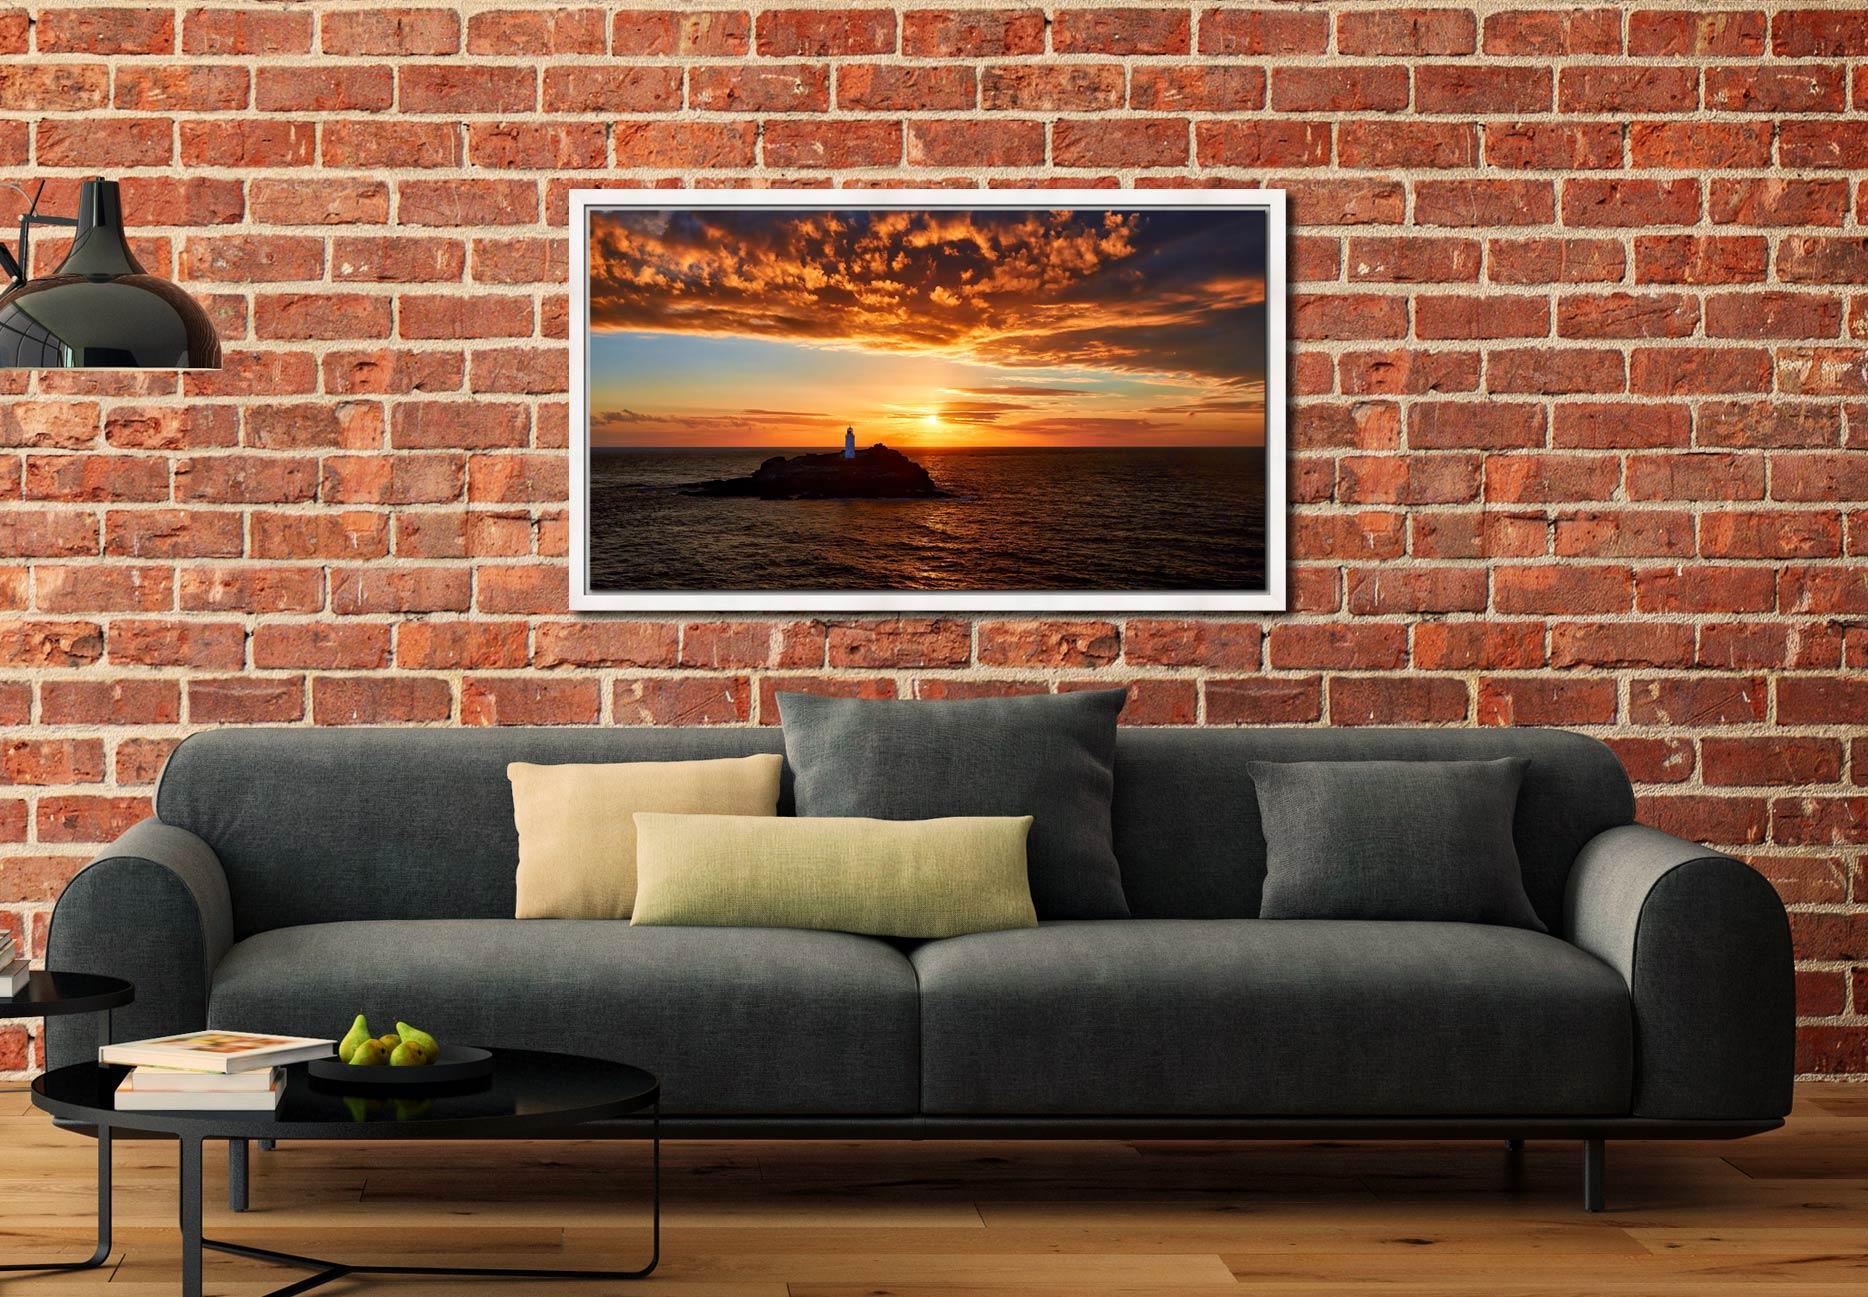 Sunset Over Godrevy Lighthouse - White Maple floater frame with acrylic glazing on Wall